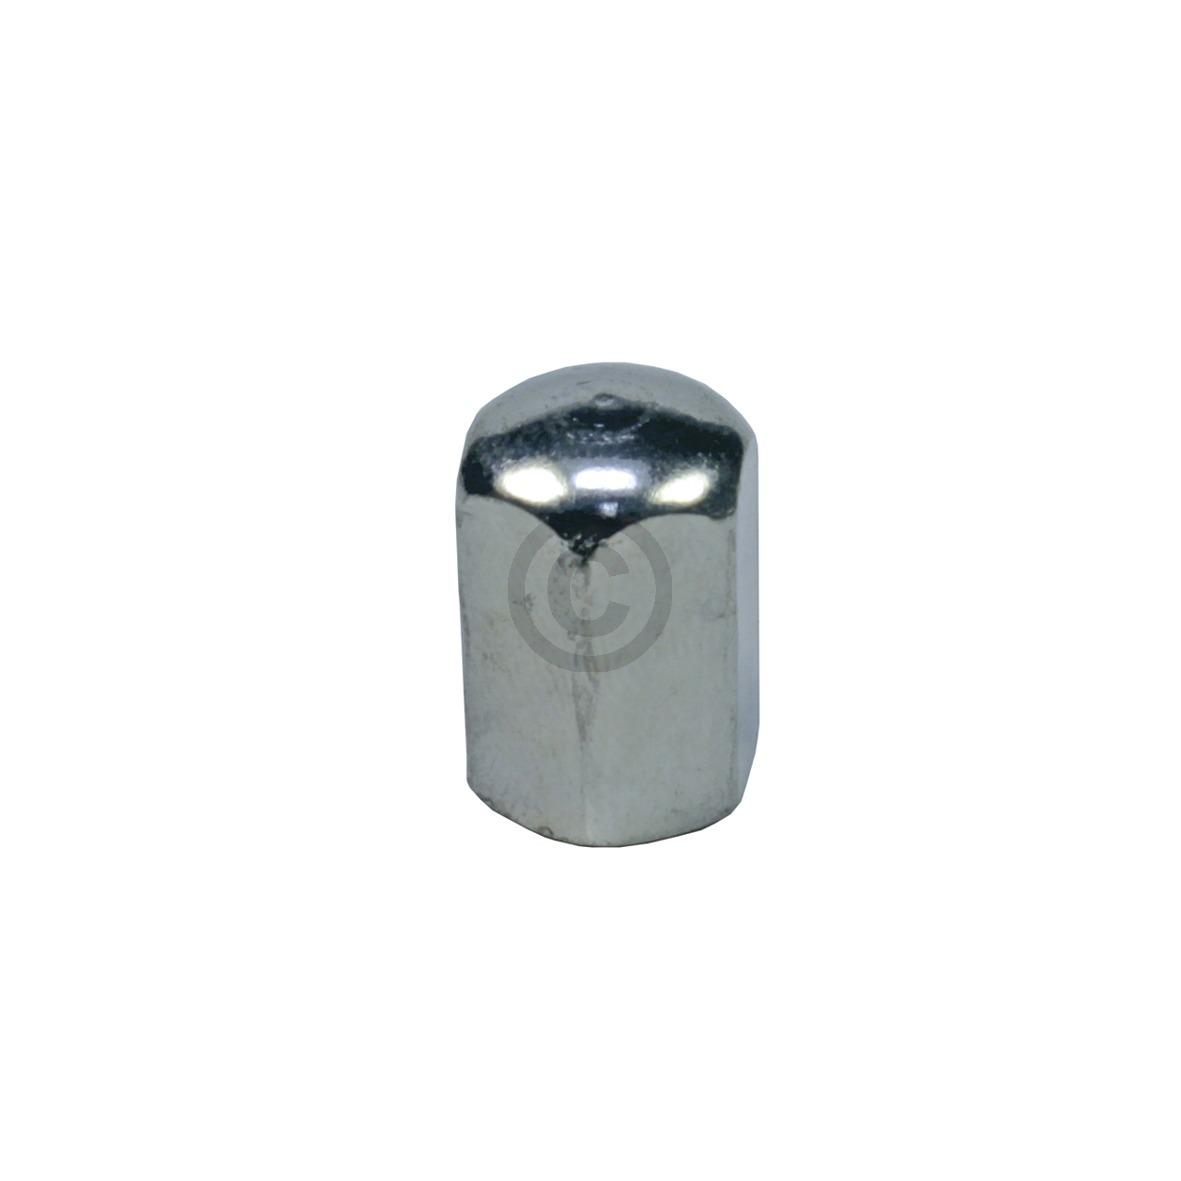 Mutter für Heißluftventilator, 10mm Sechskant 354321001 AEG, Electrolux, Juno, Z